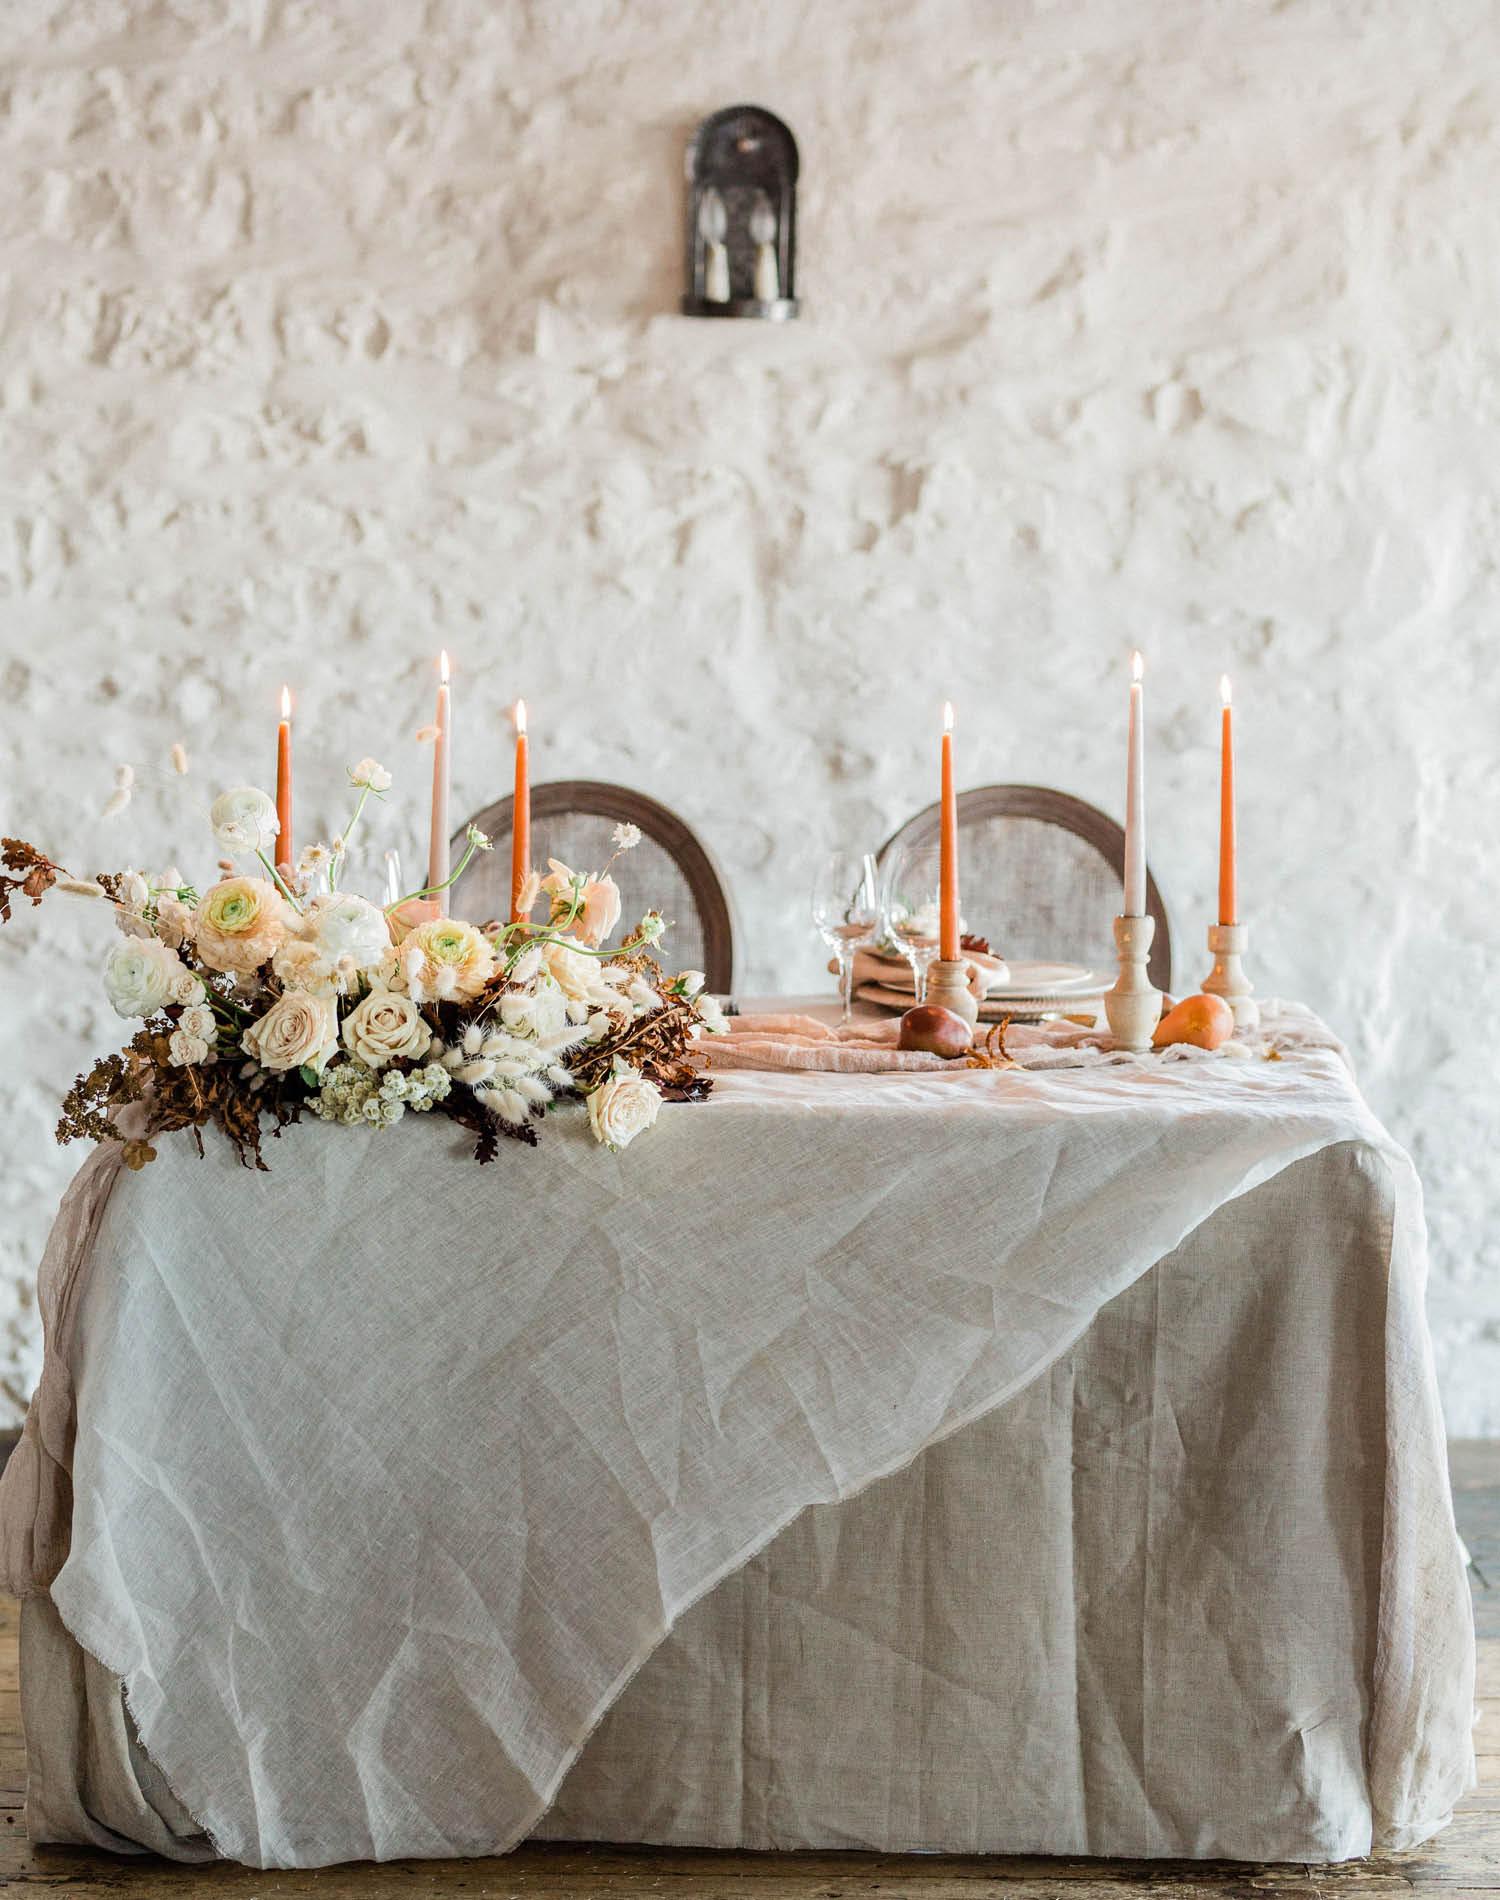 French Farm House Inspired Wedding in Quebec Auberge Saint-Antoine - Wedding Table